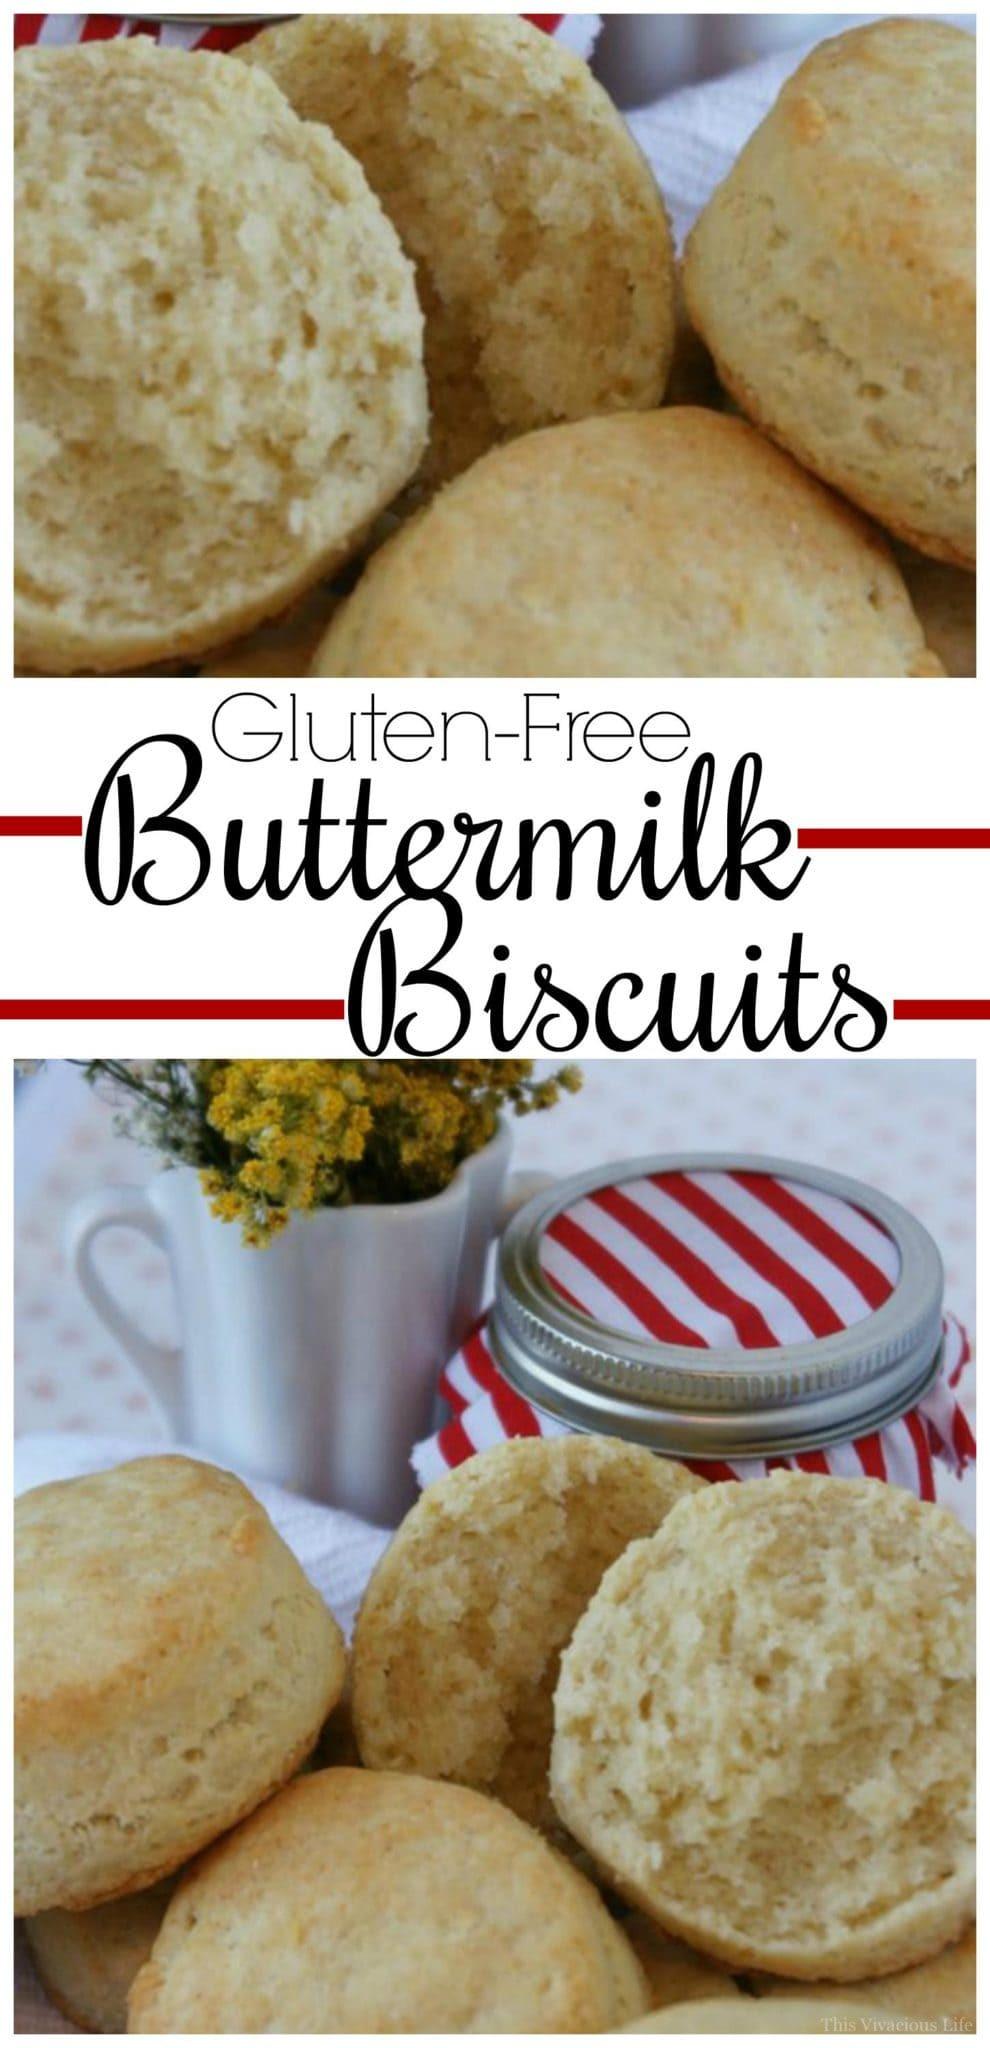 Gluten Free Buttermilk Recipes  gluten free buttermilk biscuits light and fluffy